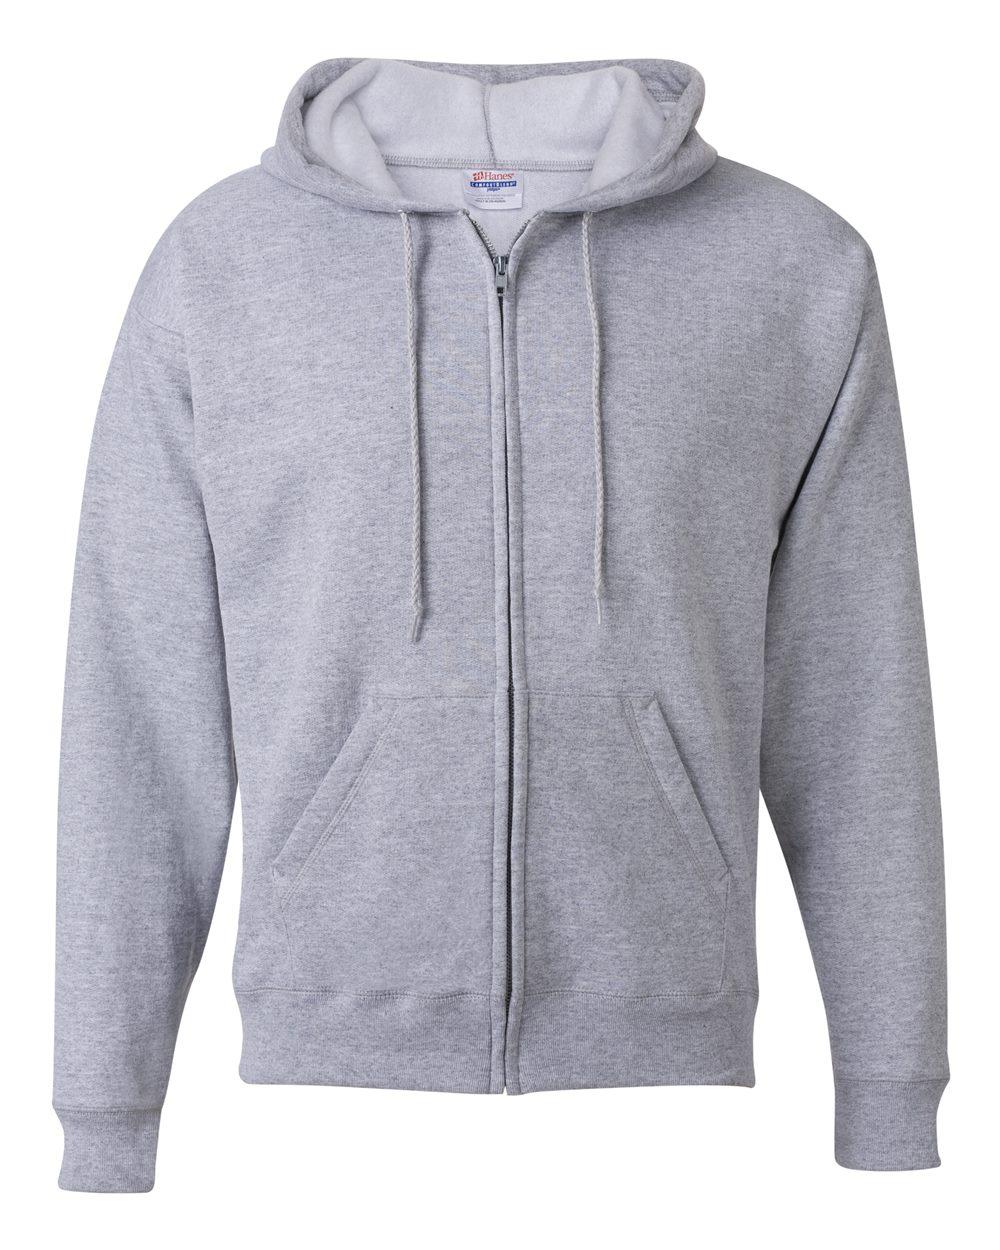 Hanes-Mens-Ecosmart-Blend-Full-Zip-Hooded-Sweatshirt-P180-up-to-3XL miniature 9